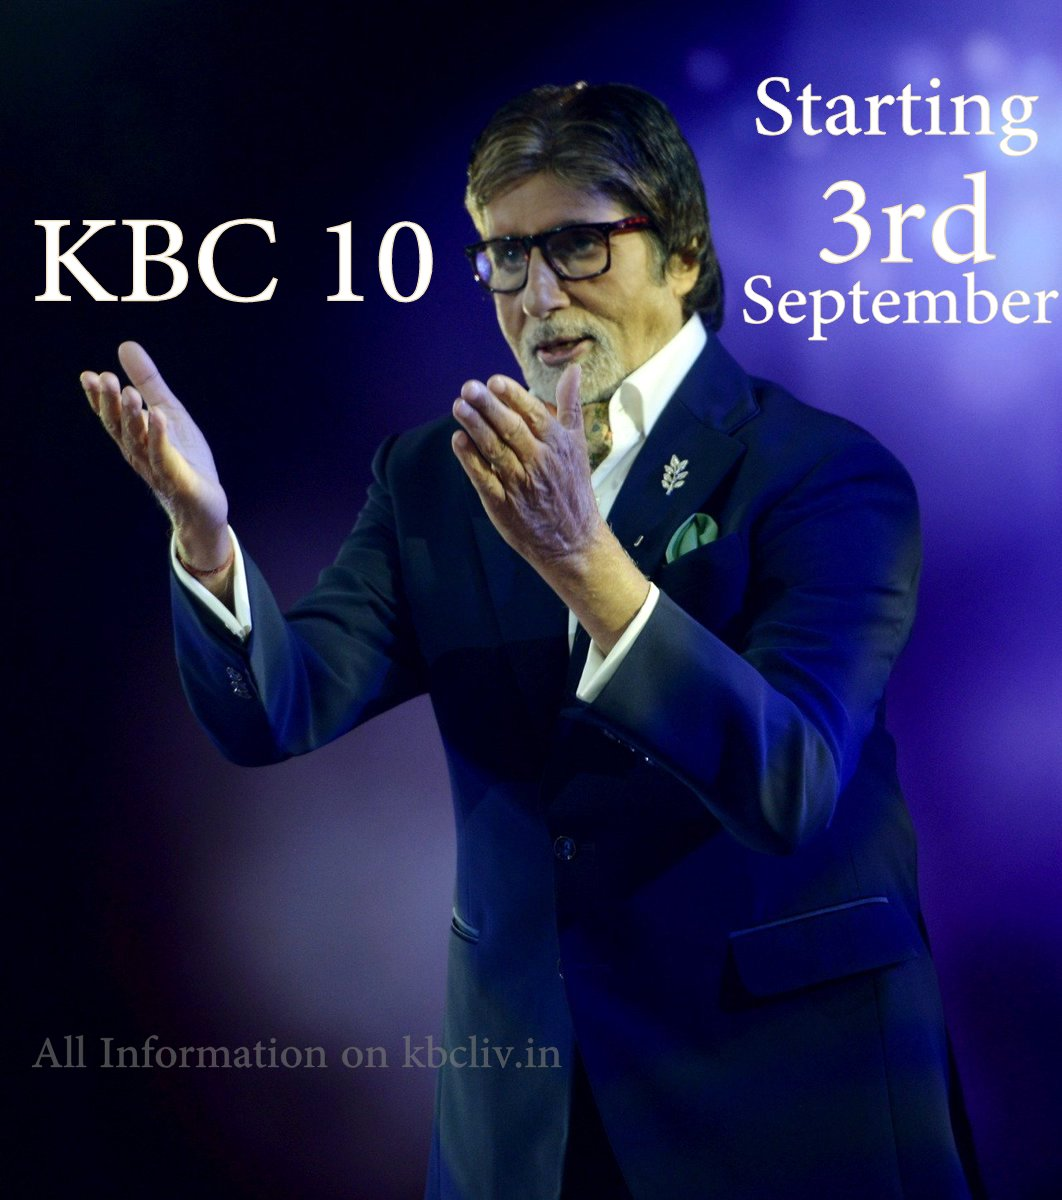 KBC Season 10 coming on 3rd September 2018 on Monday